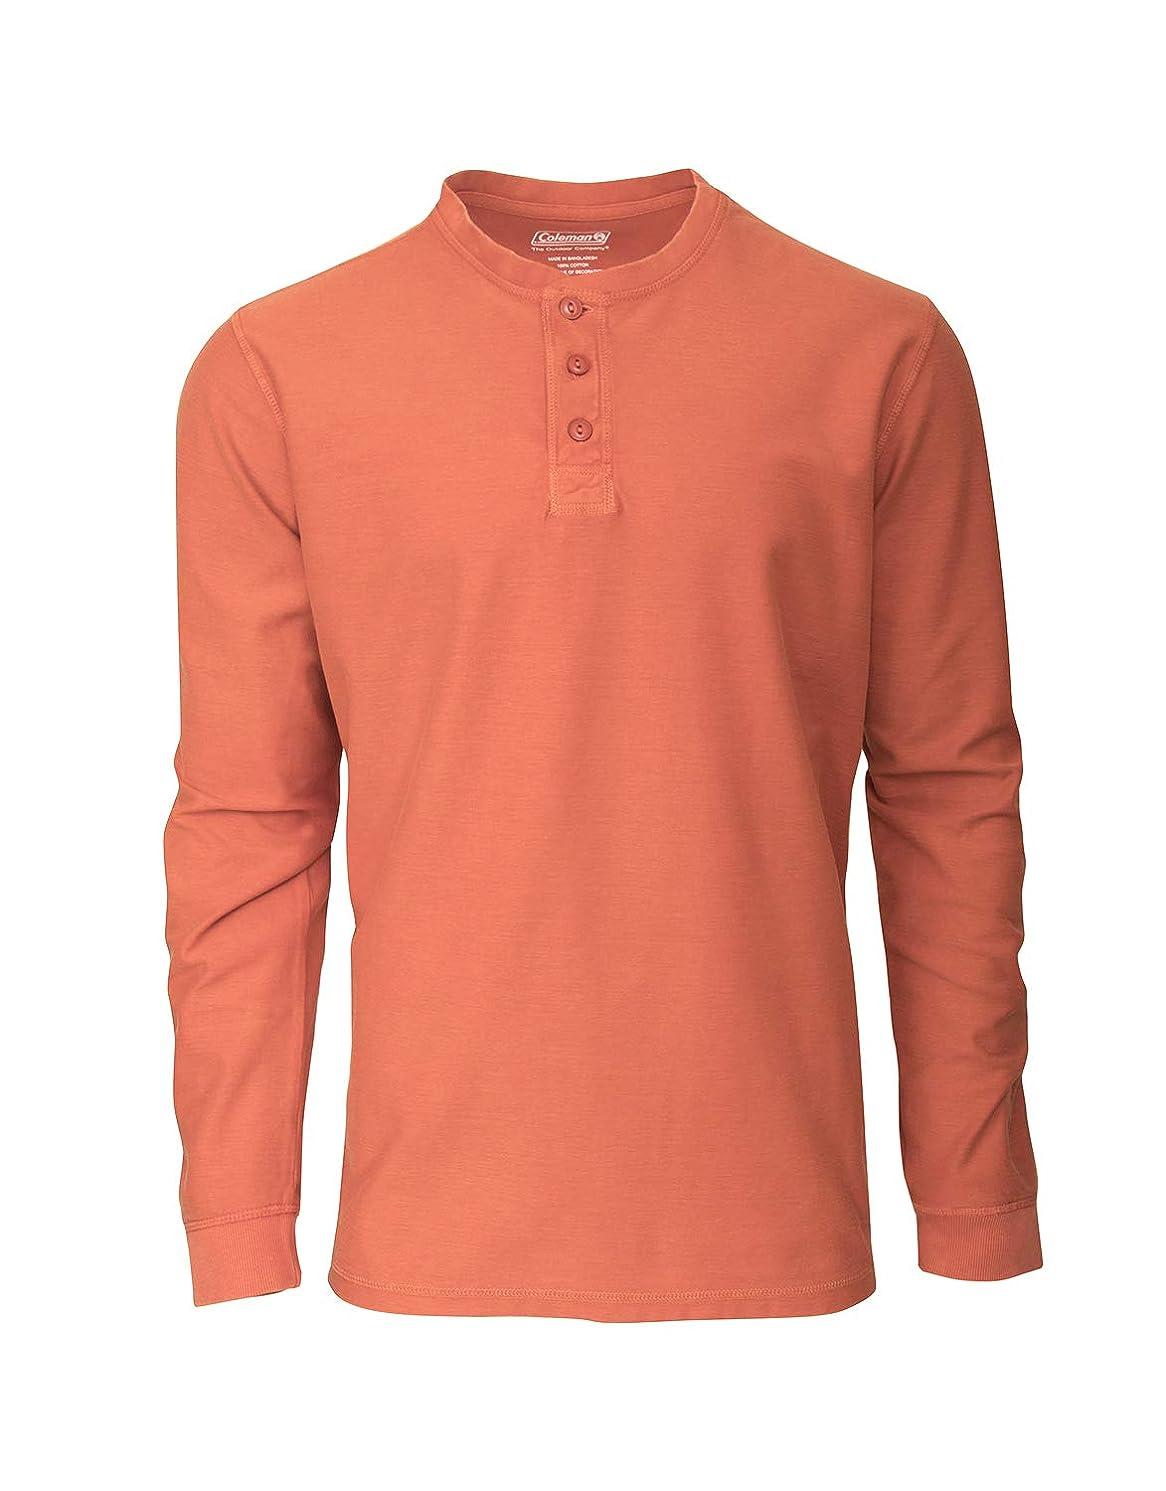 Coleman Long-Sleeve Waffle Henley Thermal Shirts Men